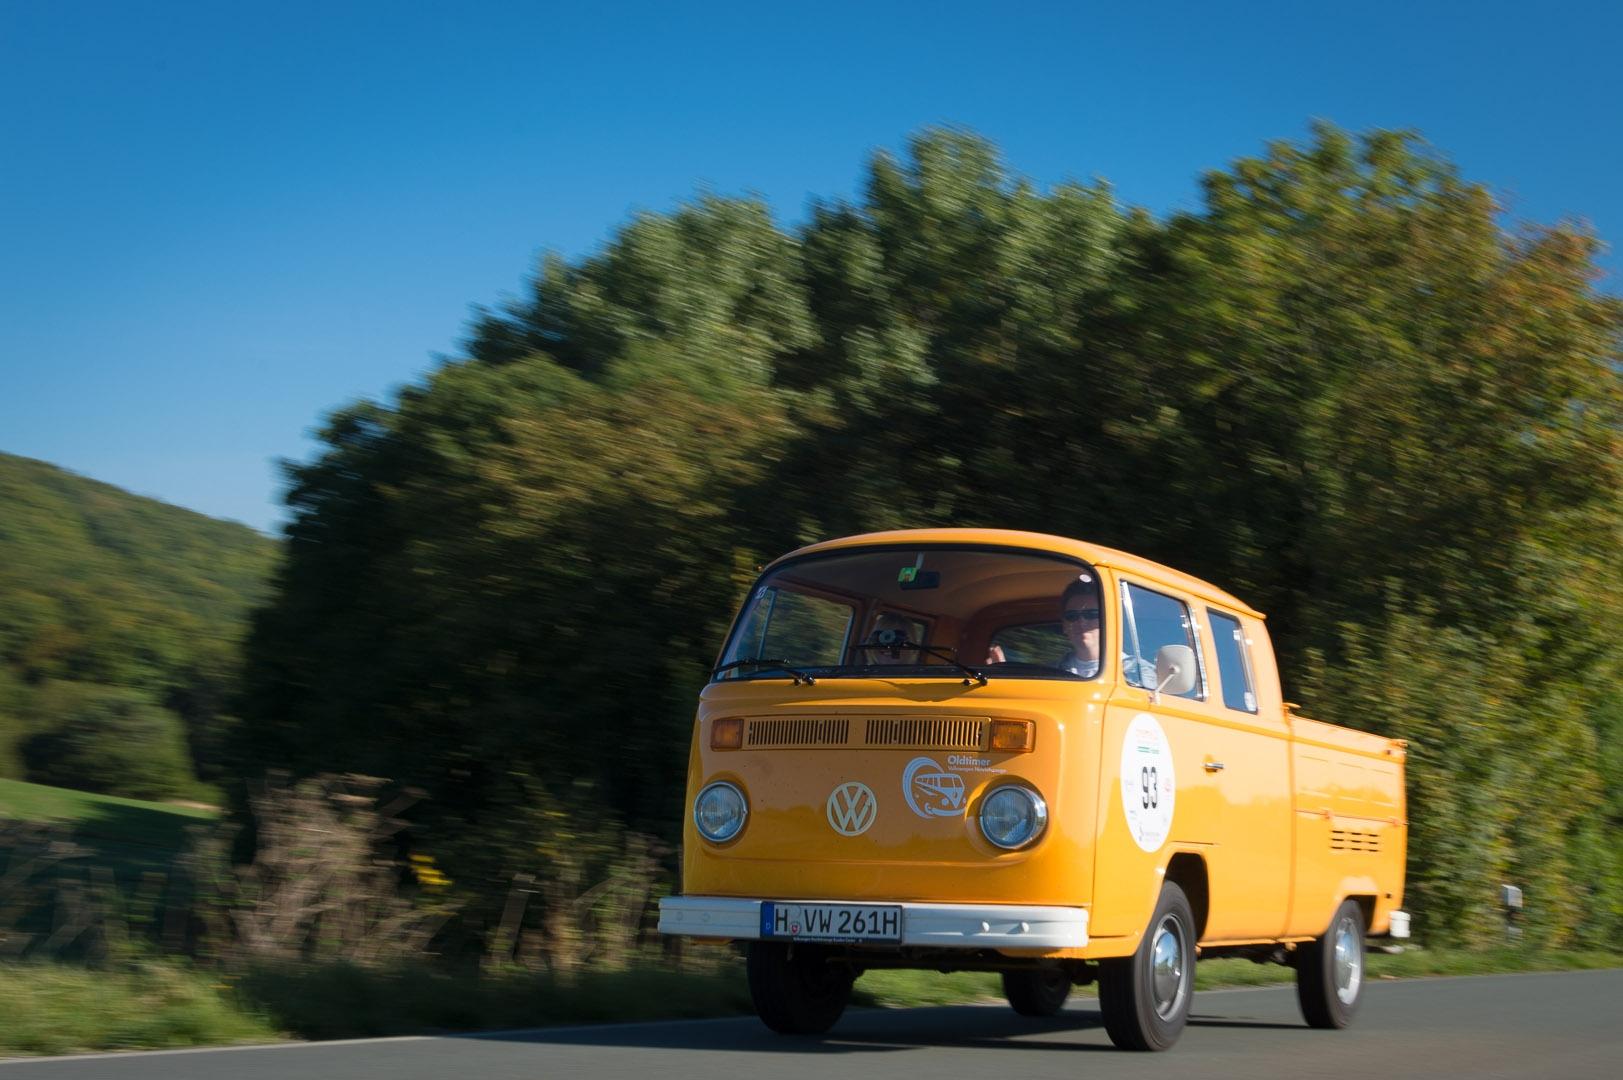 2013-foto-autos-creme21-creme-21-yountimer-rallye-92